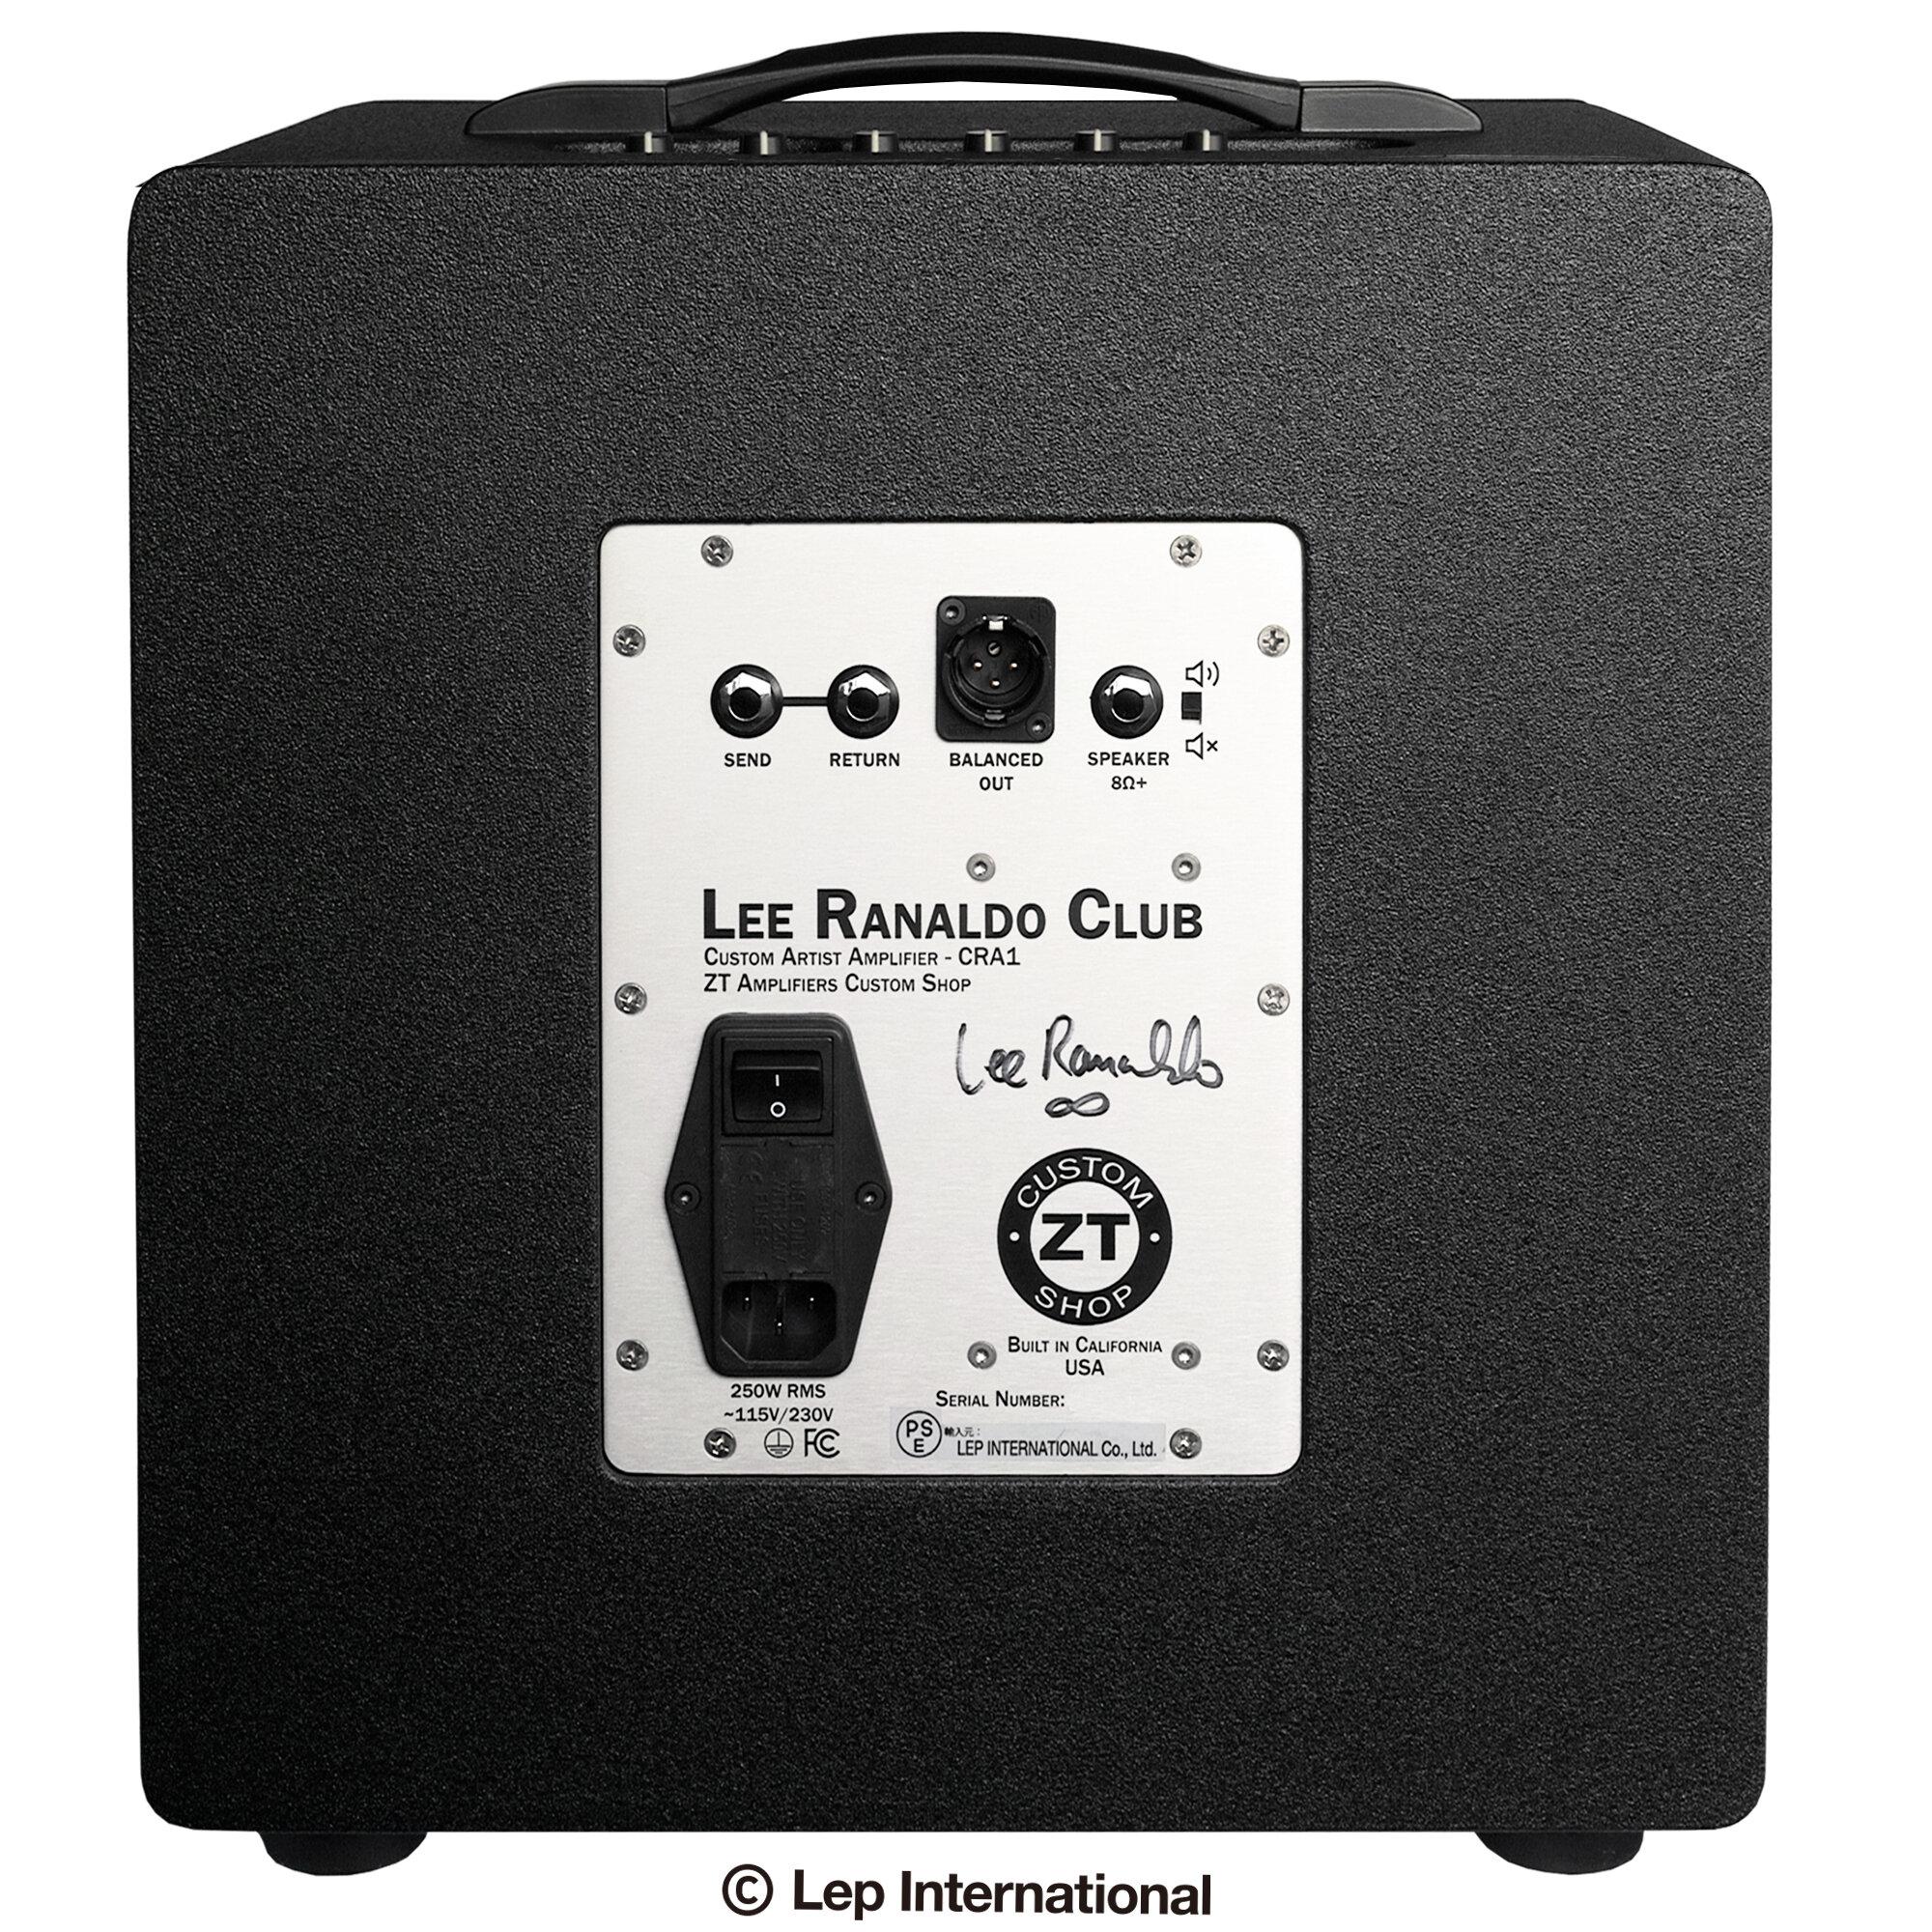 Lee-Ranalodo-Club-Amp-03.jpg